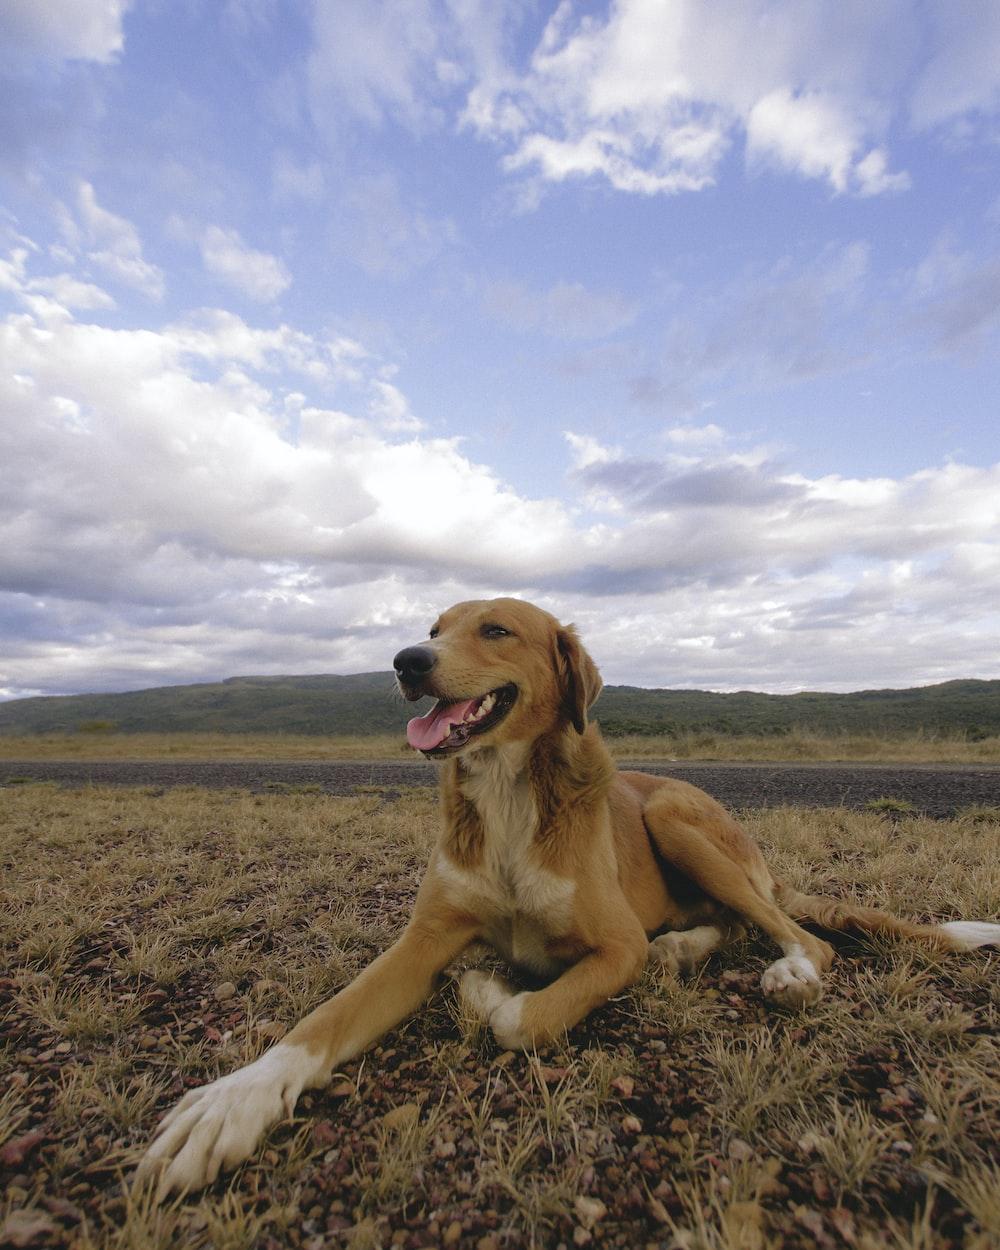 golden retriever lying on brown field under blue sky during daytime